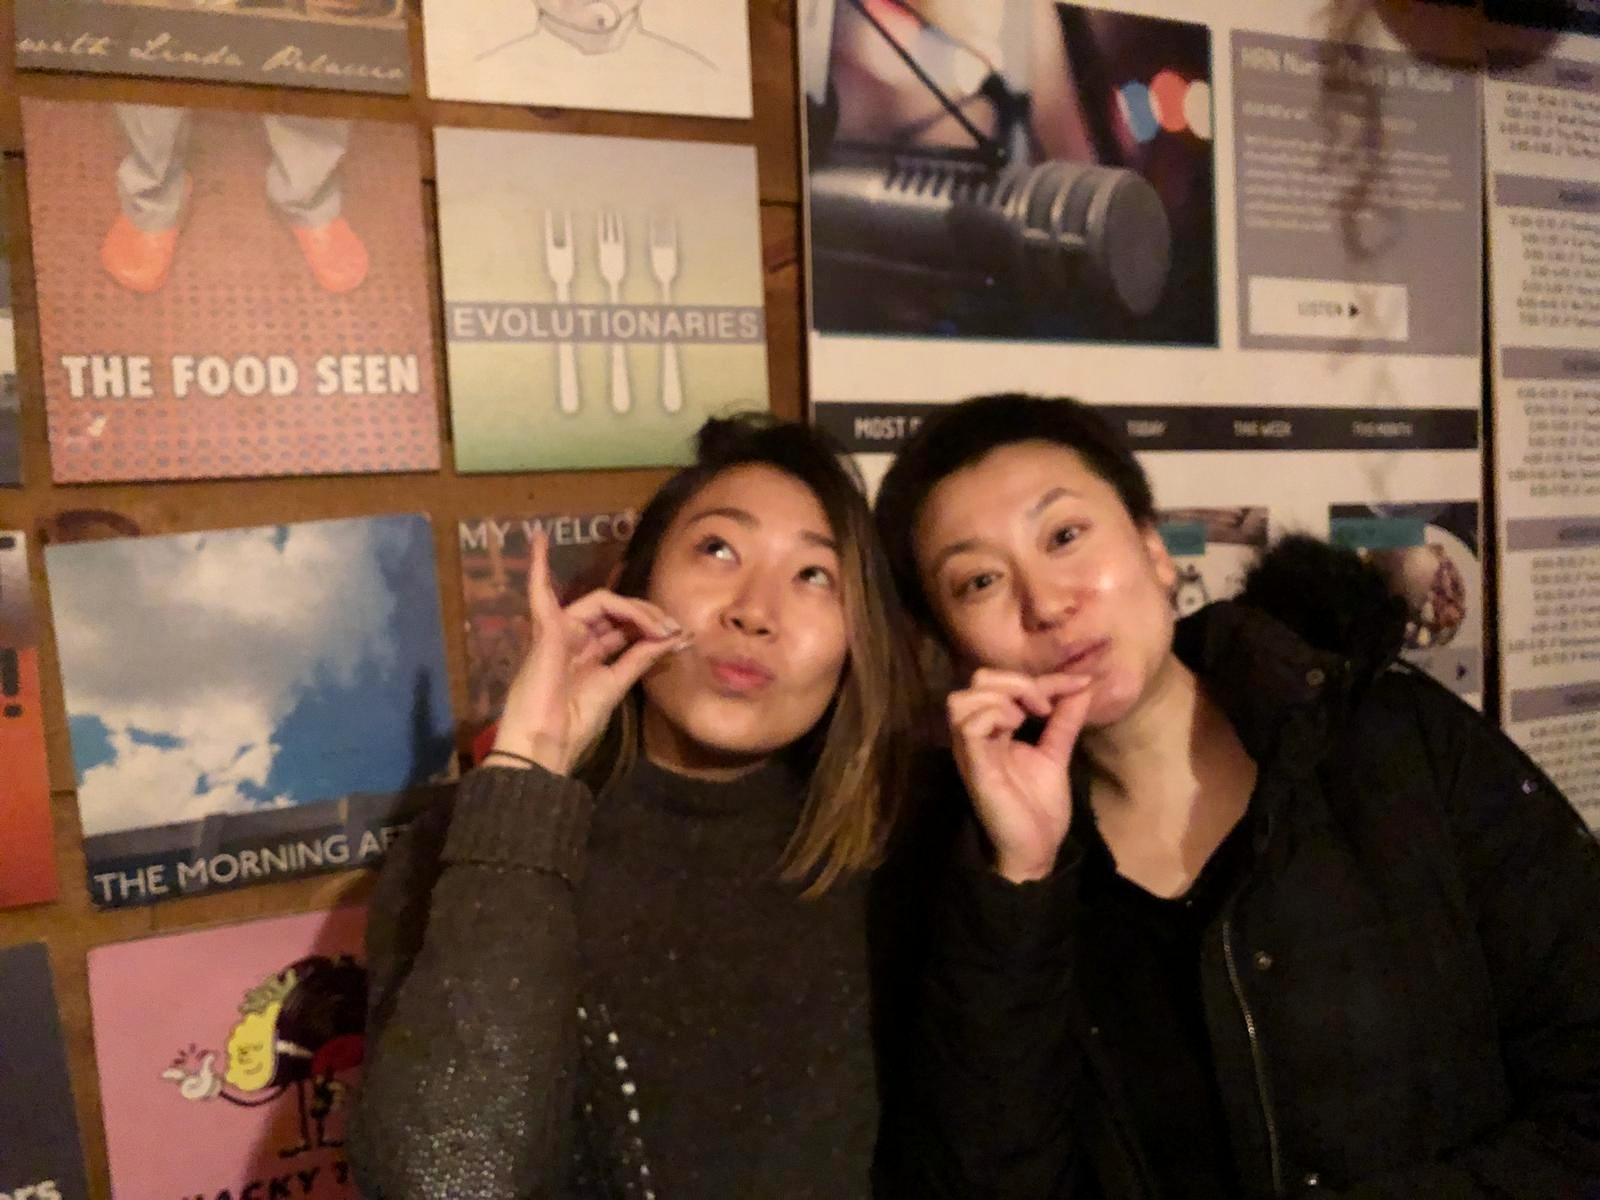 Lynda and Shunan